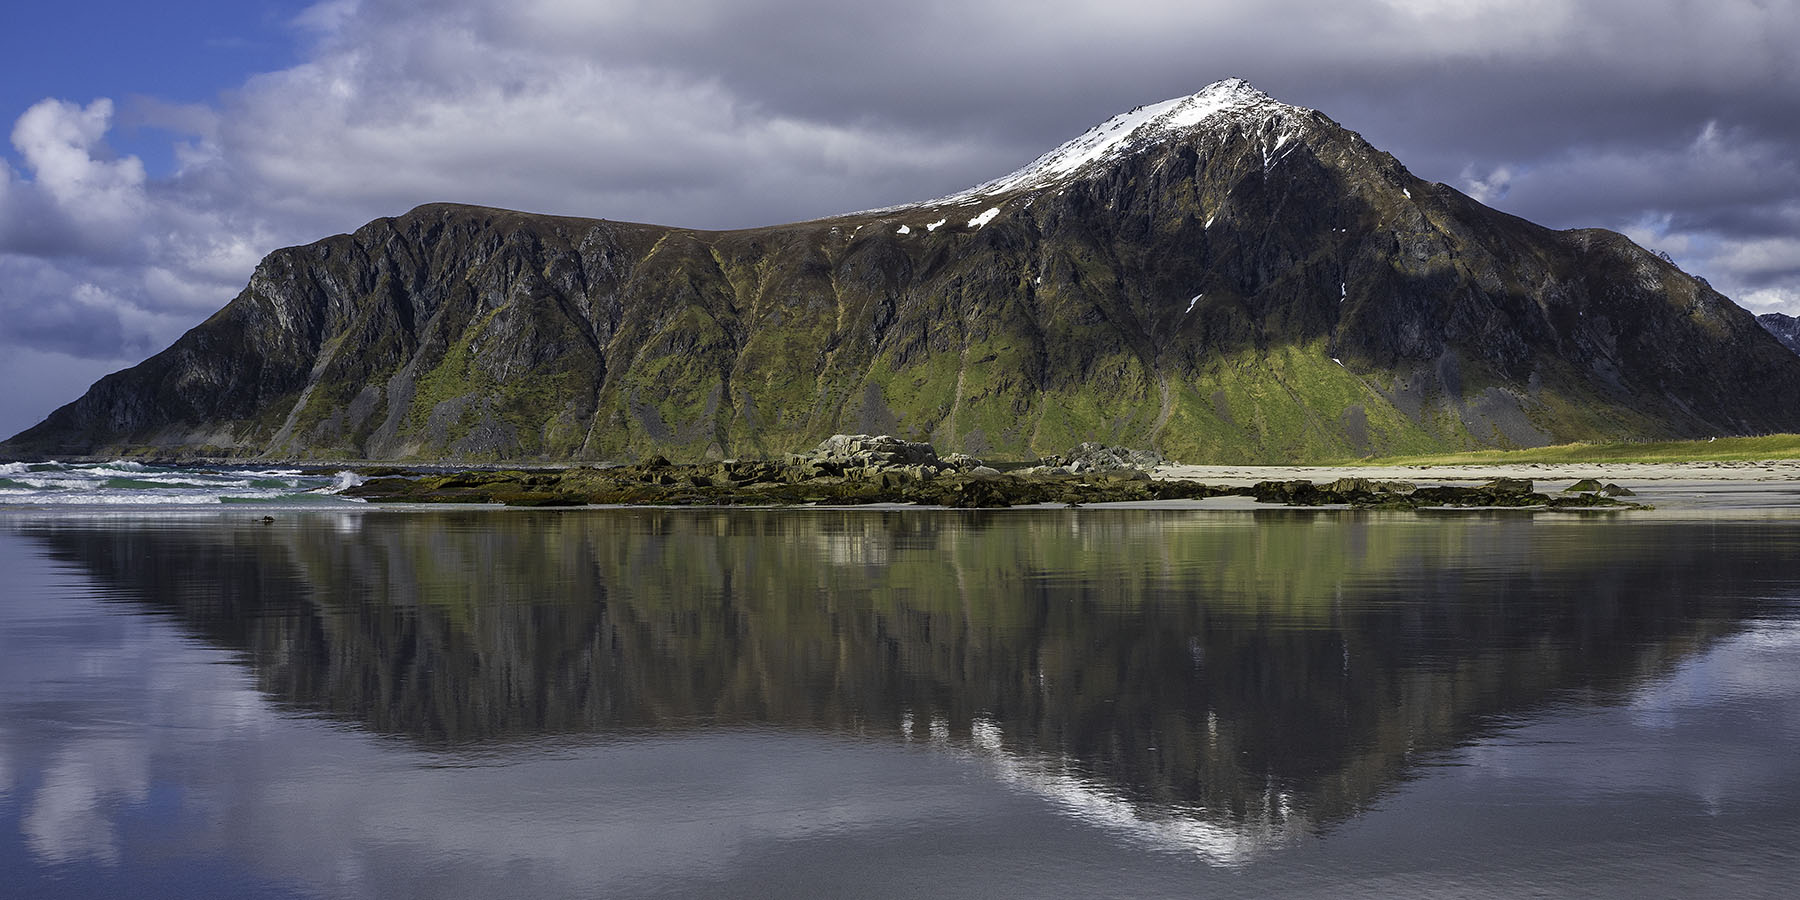 Mount Hustinden's reflection on the wet sand of Skagsanden beach - Flakstad, Lofoten Islands, Norway